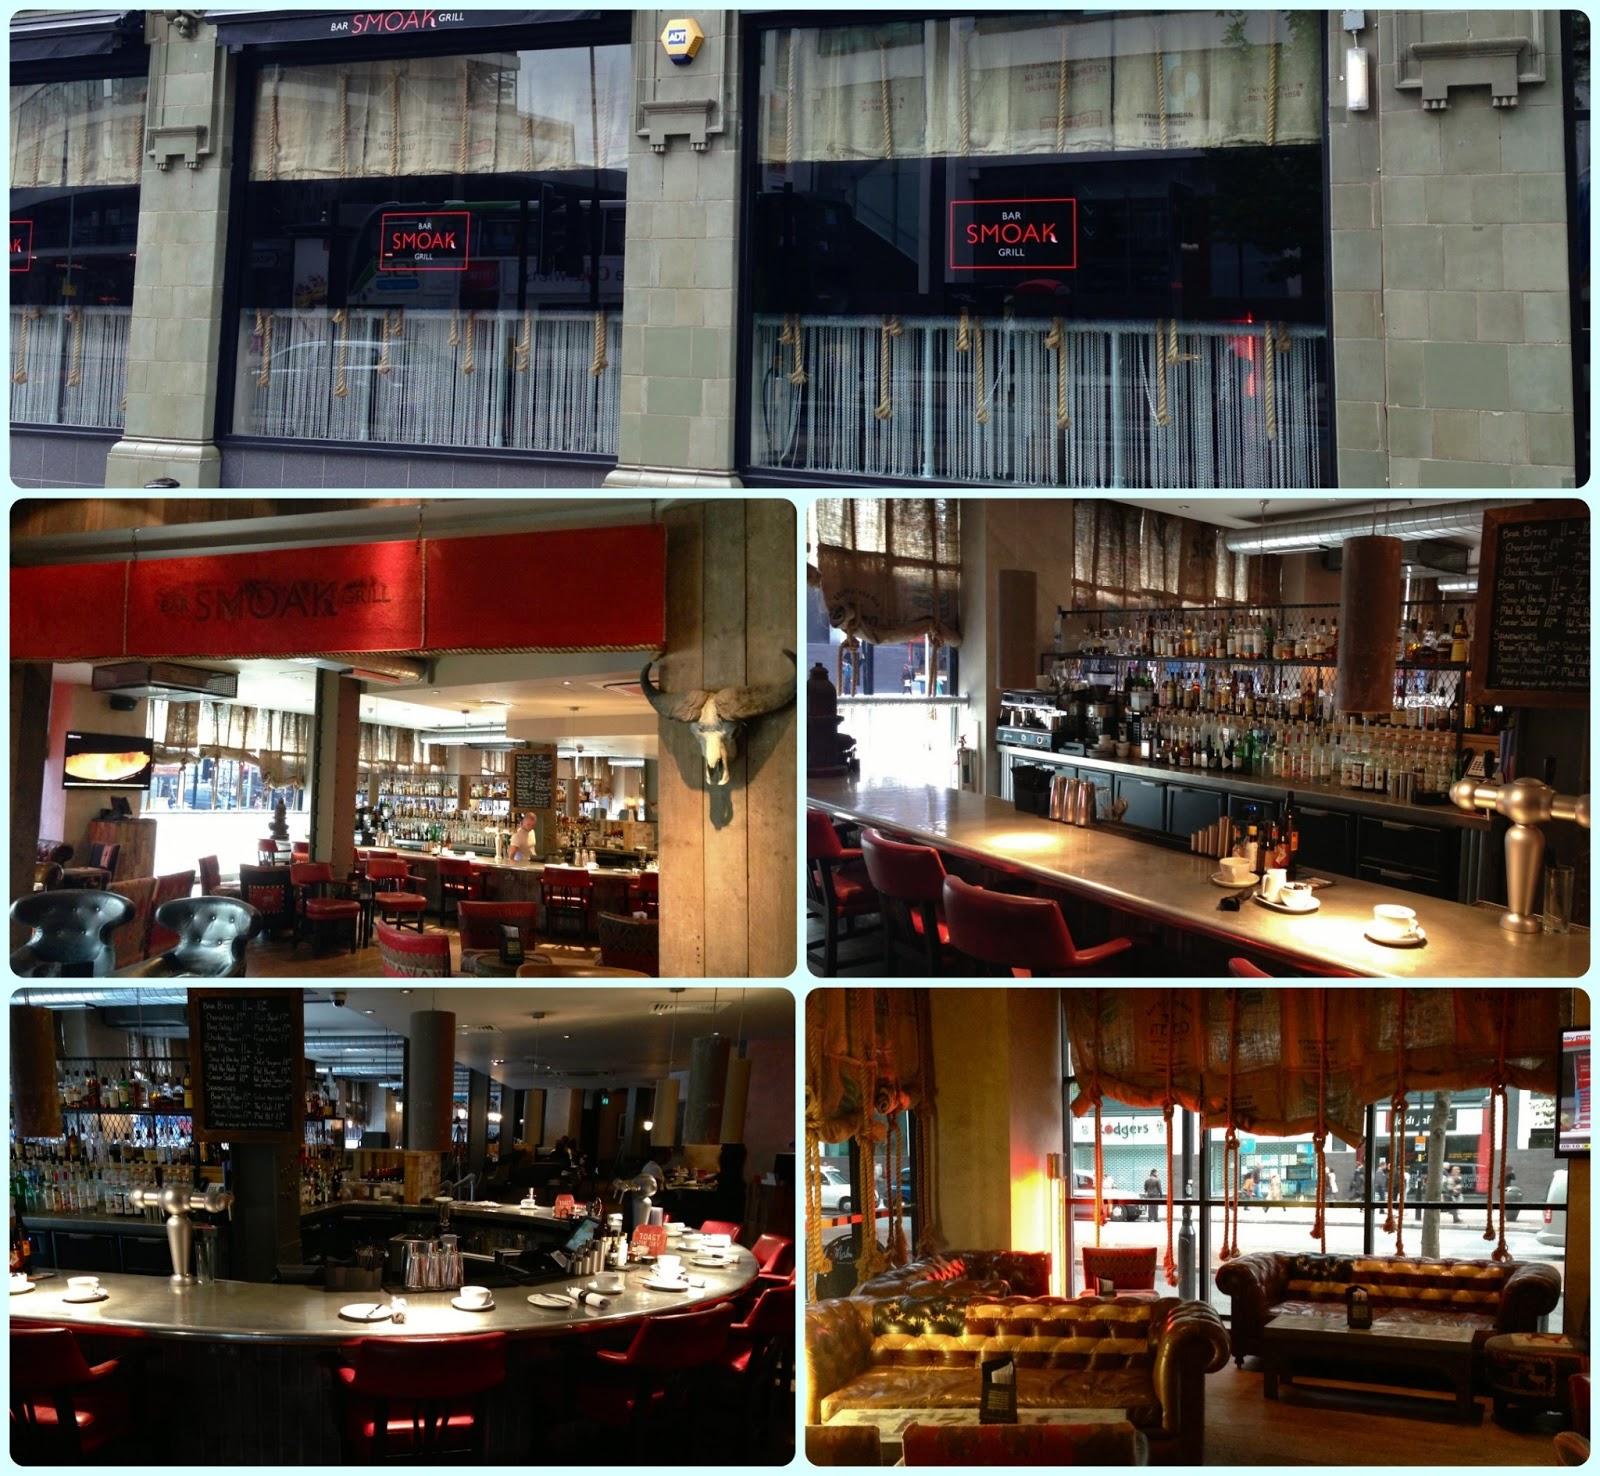 Smoak Bar And Grill Malmaison Hotel Manchester Dollybakes